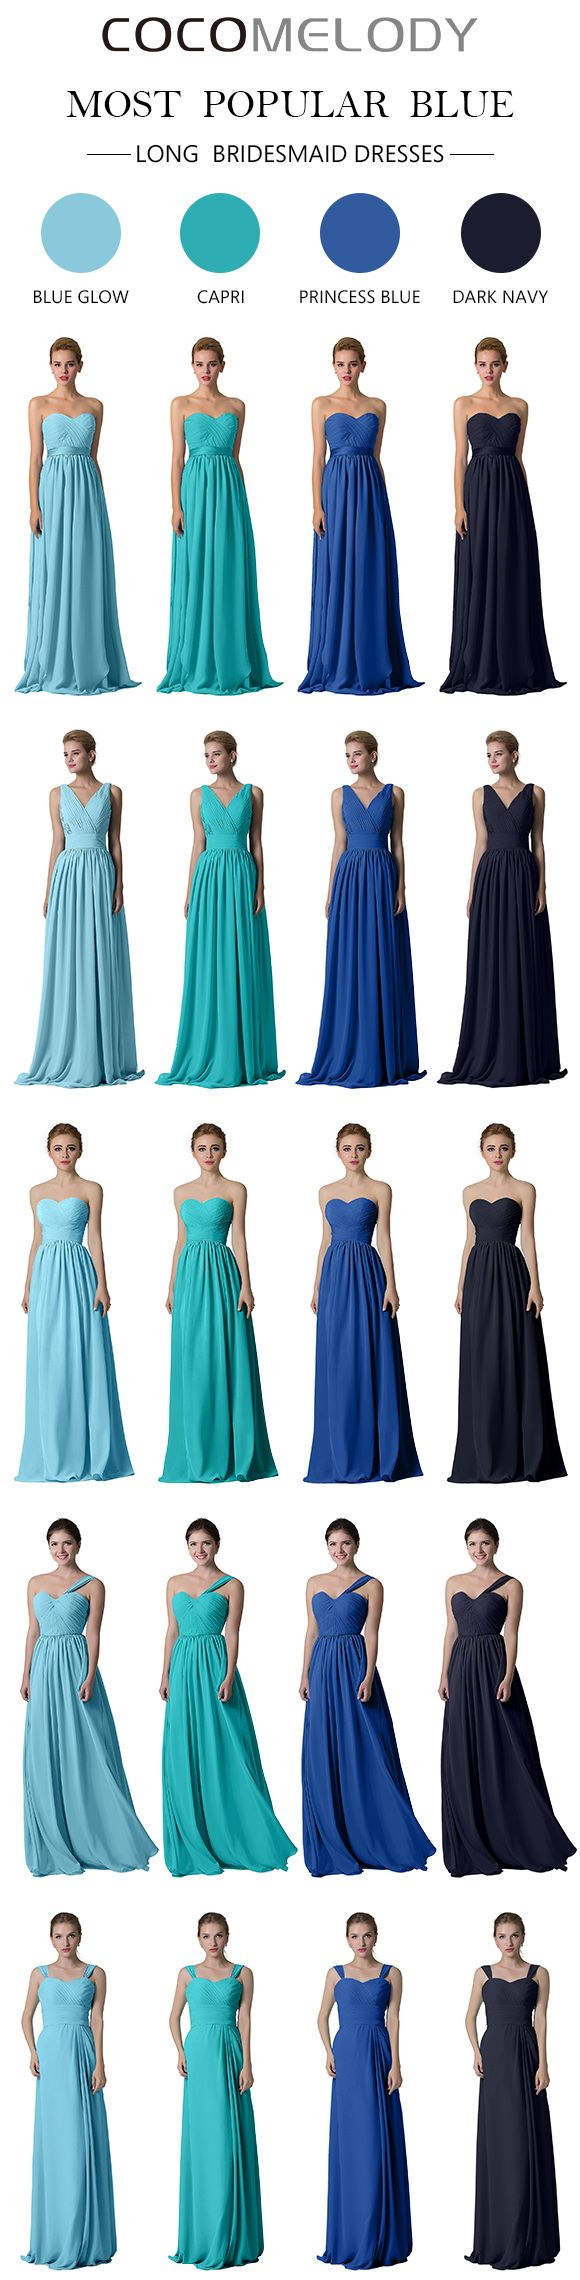 Most Popular Blue Chiffon Bridesmaid Dresses. #bridesmaiddresses #cocomelody #wedding #chiffondresses #longdresses #bridesmaids